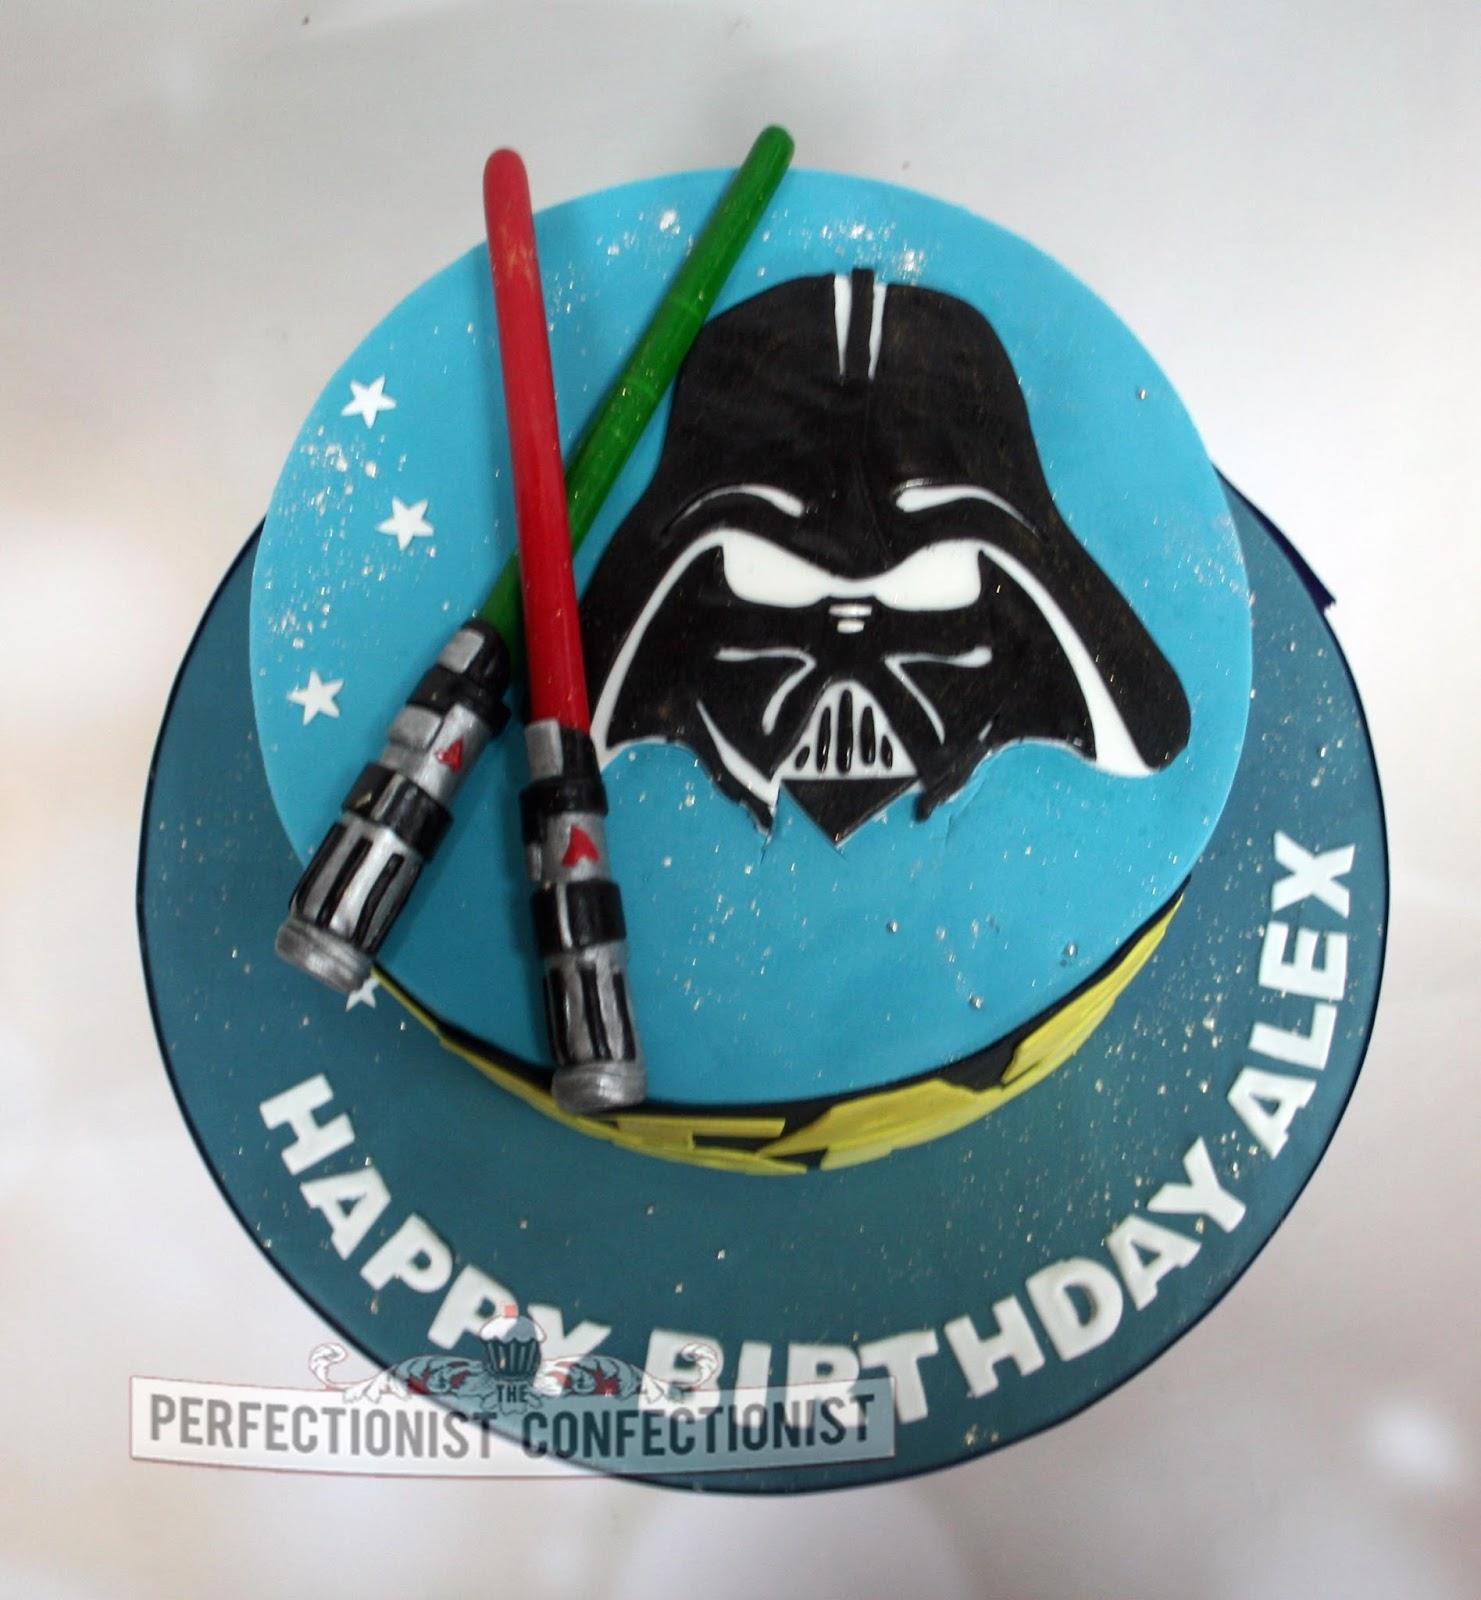 The Perfectionist Confectionist Alex Starwars Birthday Cake